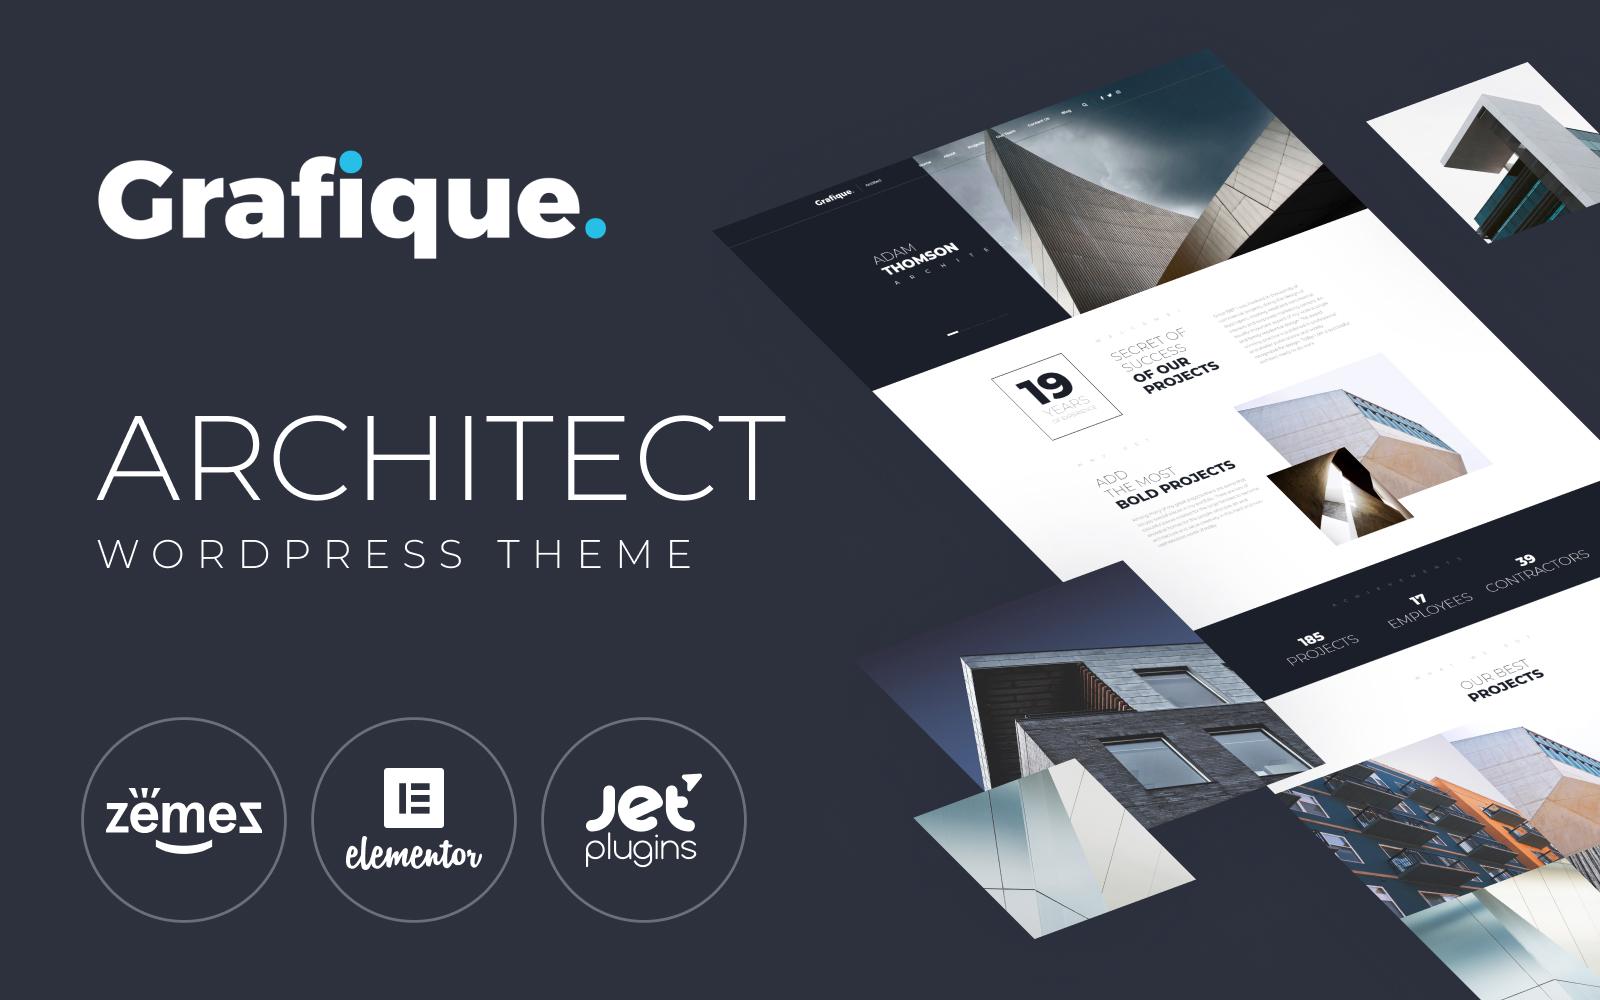 Reszponzív Grafique - Architect WordPress sablon 66049